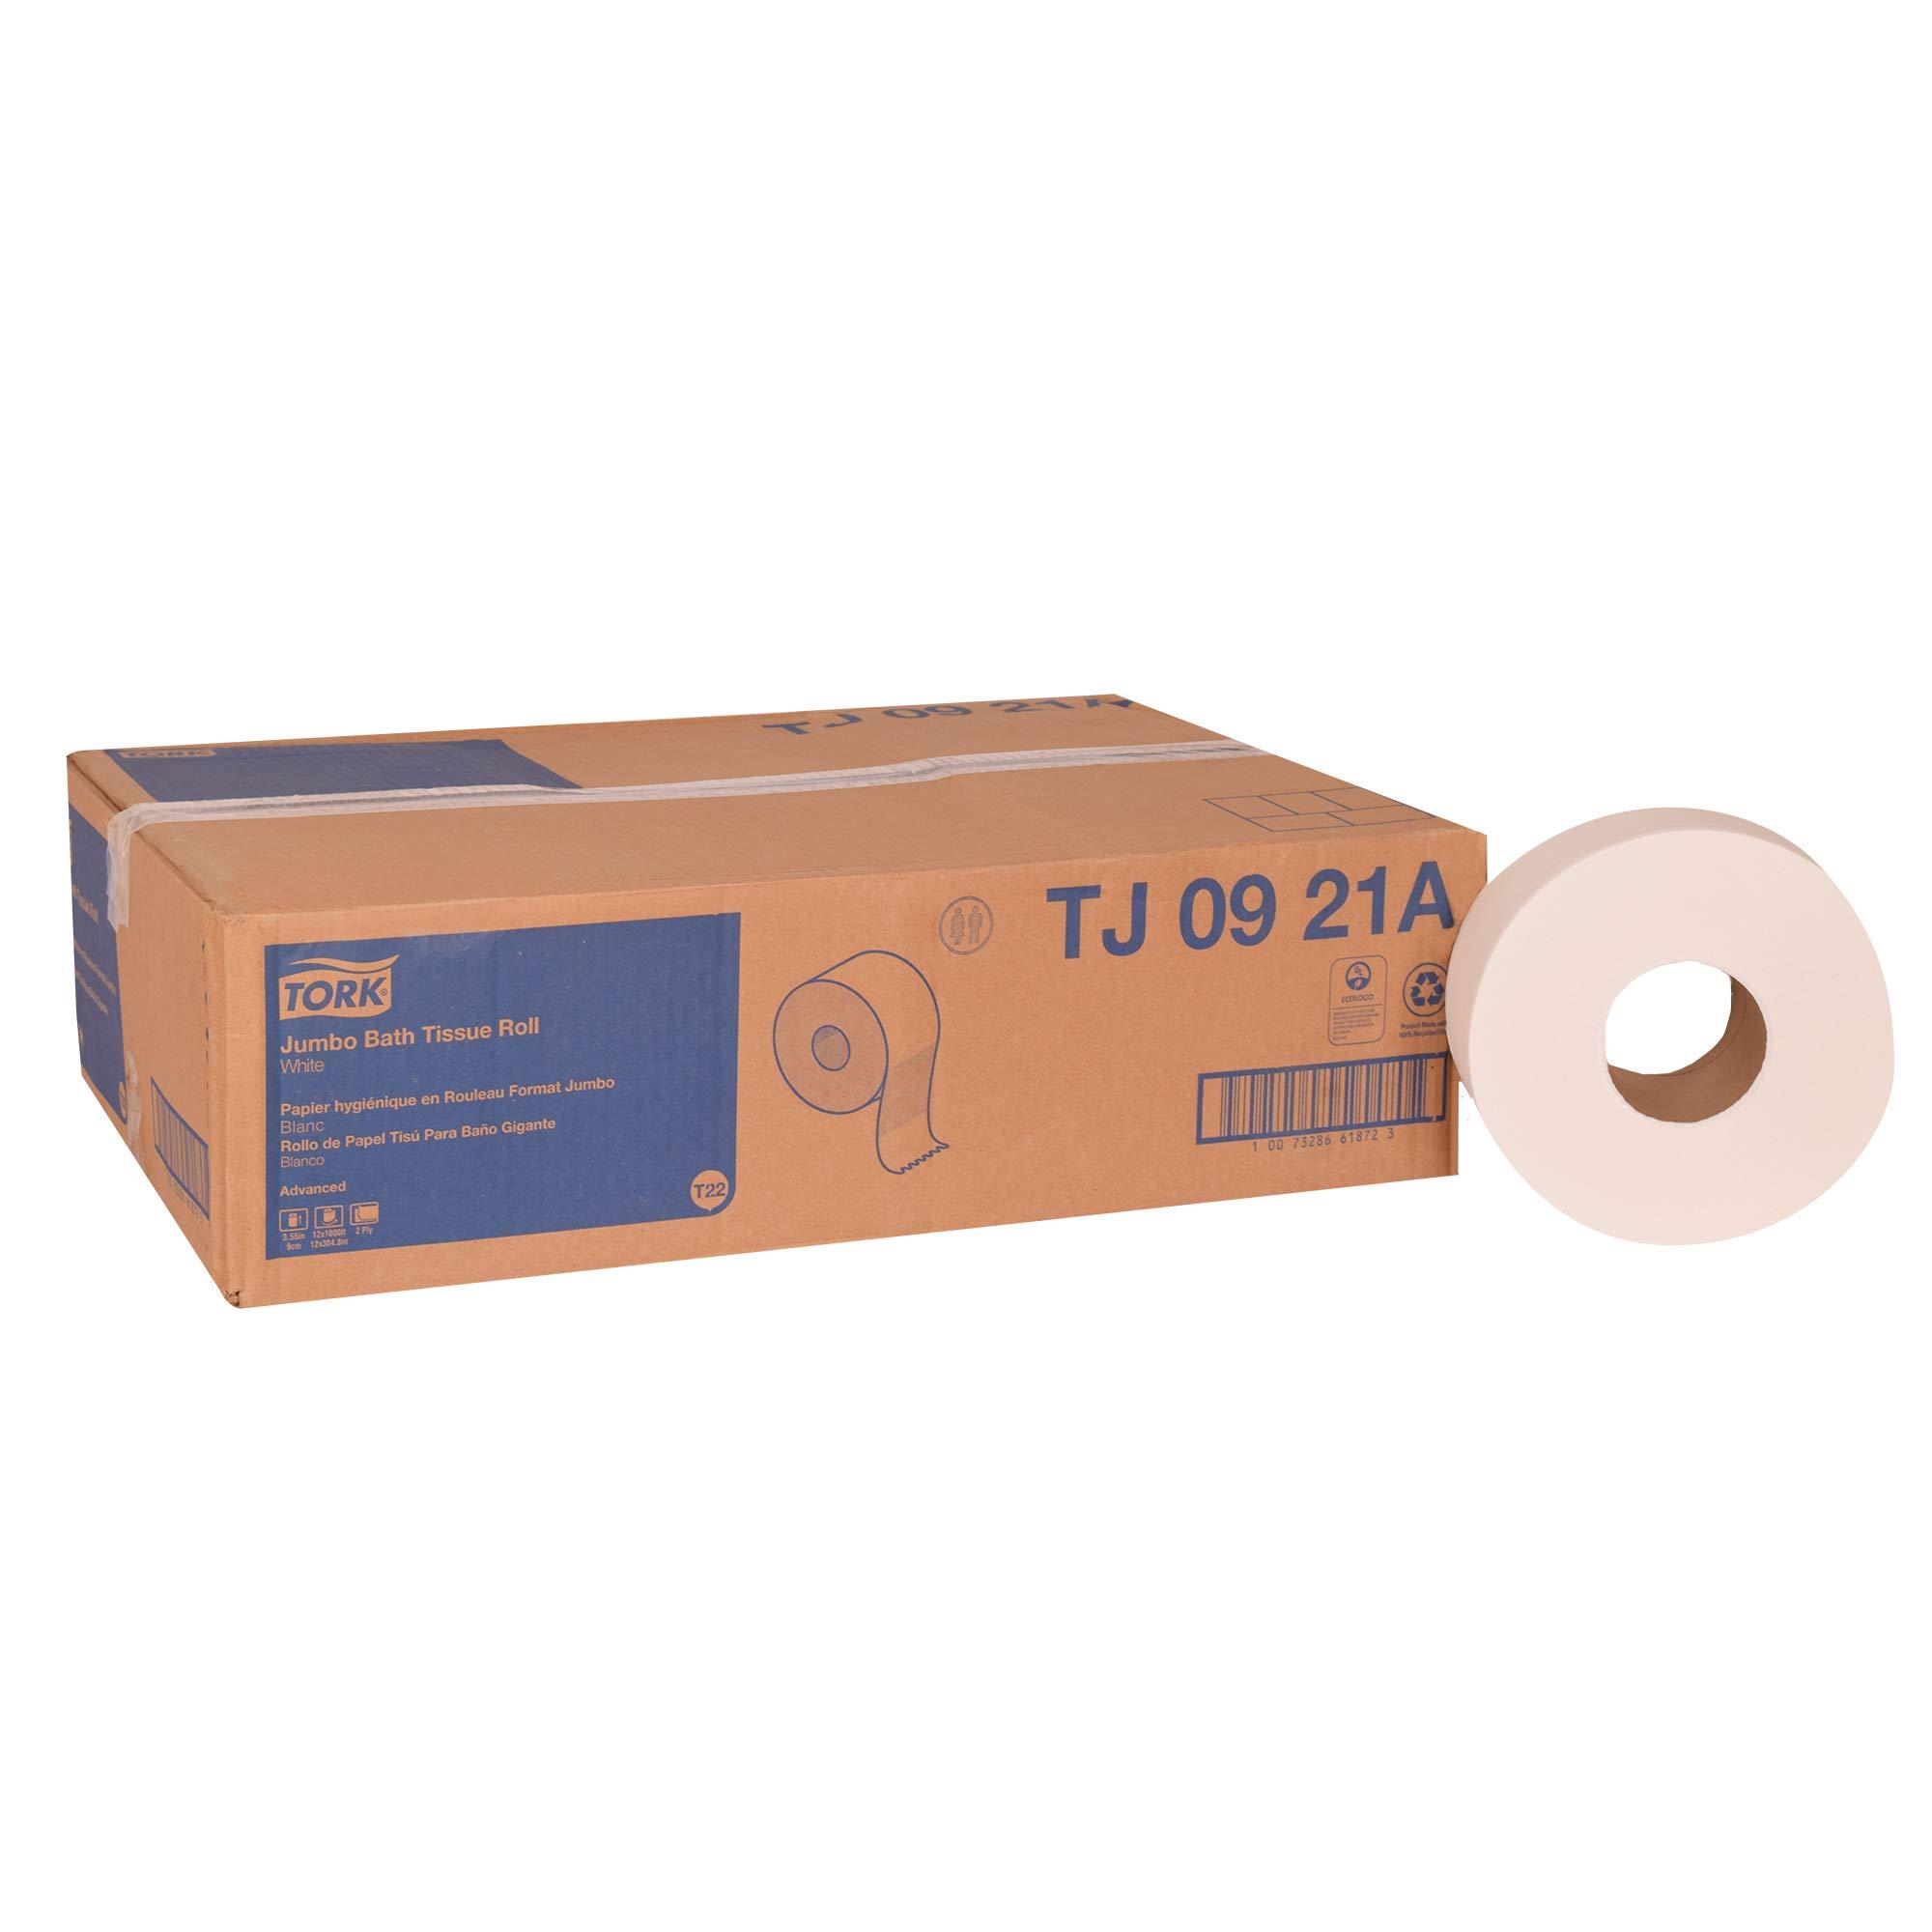 Tork Advanced TJ0921A Jumbo Bath Tissue Roll, 2-Ply, 8.8'' Dia, 3.55'' Width x 1,000' Length, White (Case of 12 Rolls, 1,000 per Roll, 12,000 Feet)